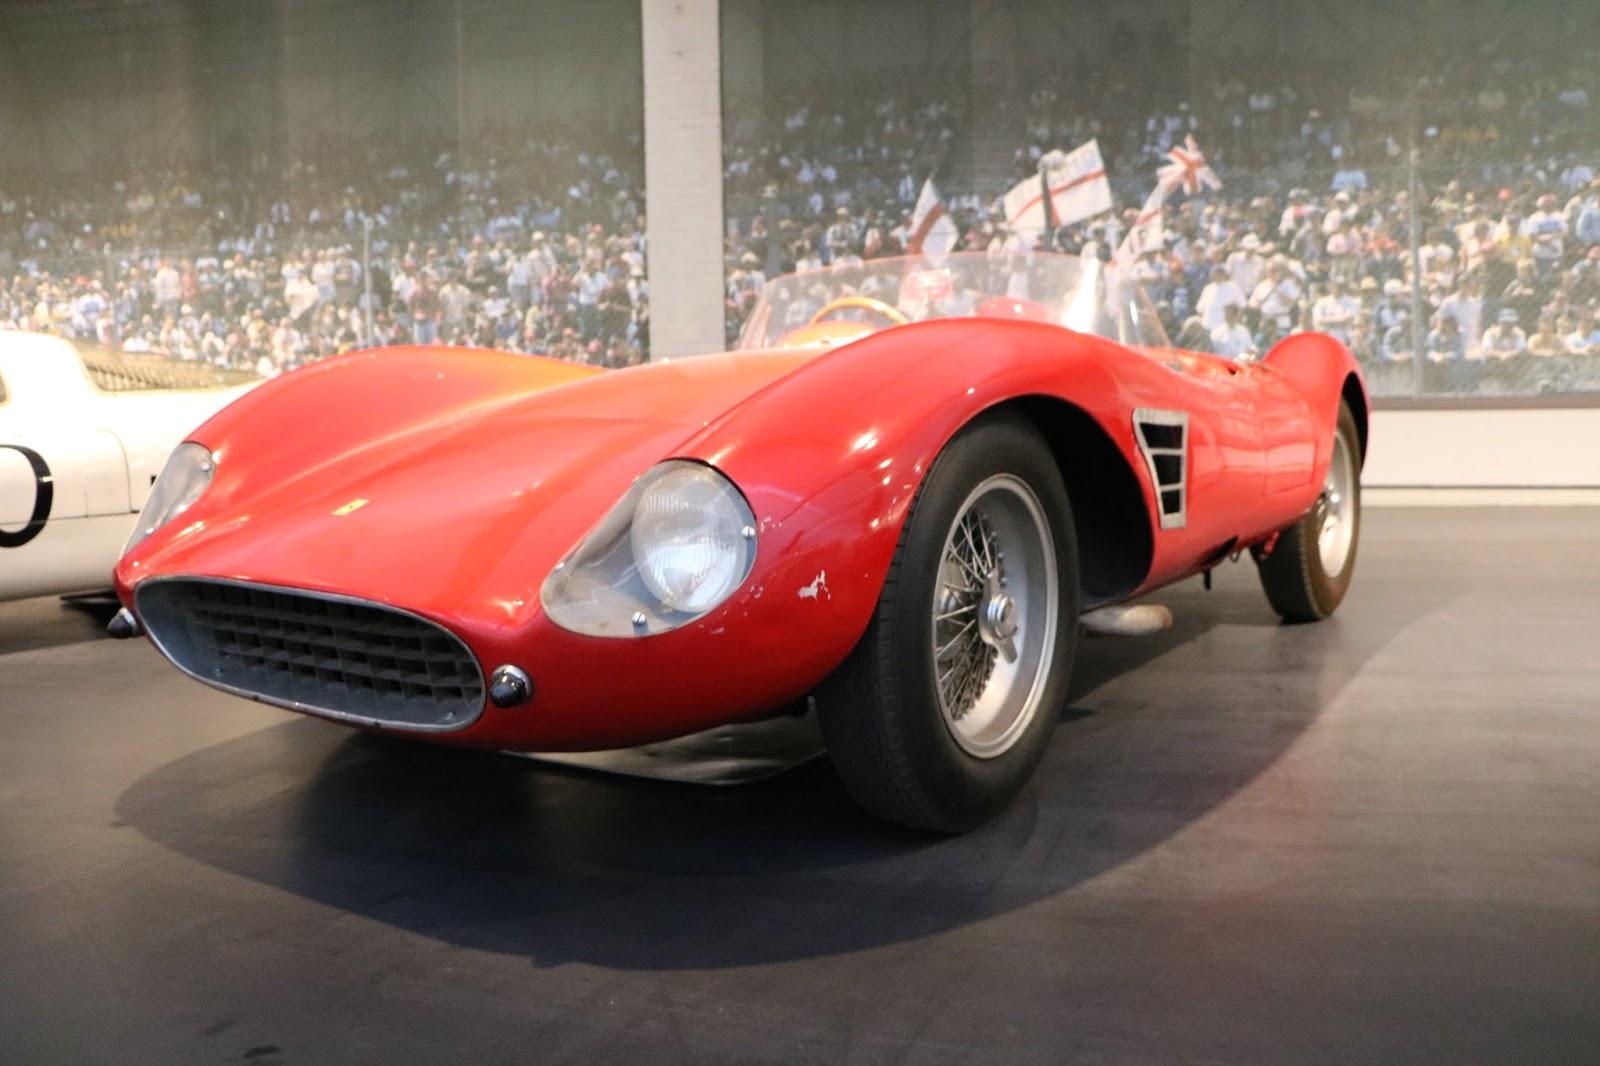 Schlumpf Collection 1079 - 1957 Ferrari Biplace Sport 500 TRC.jpg